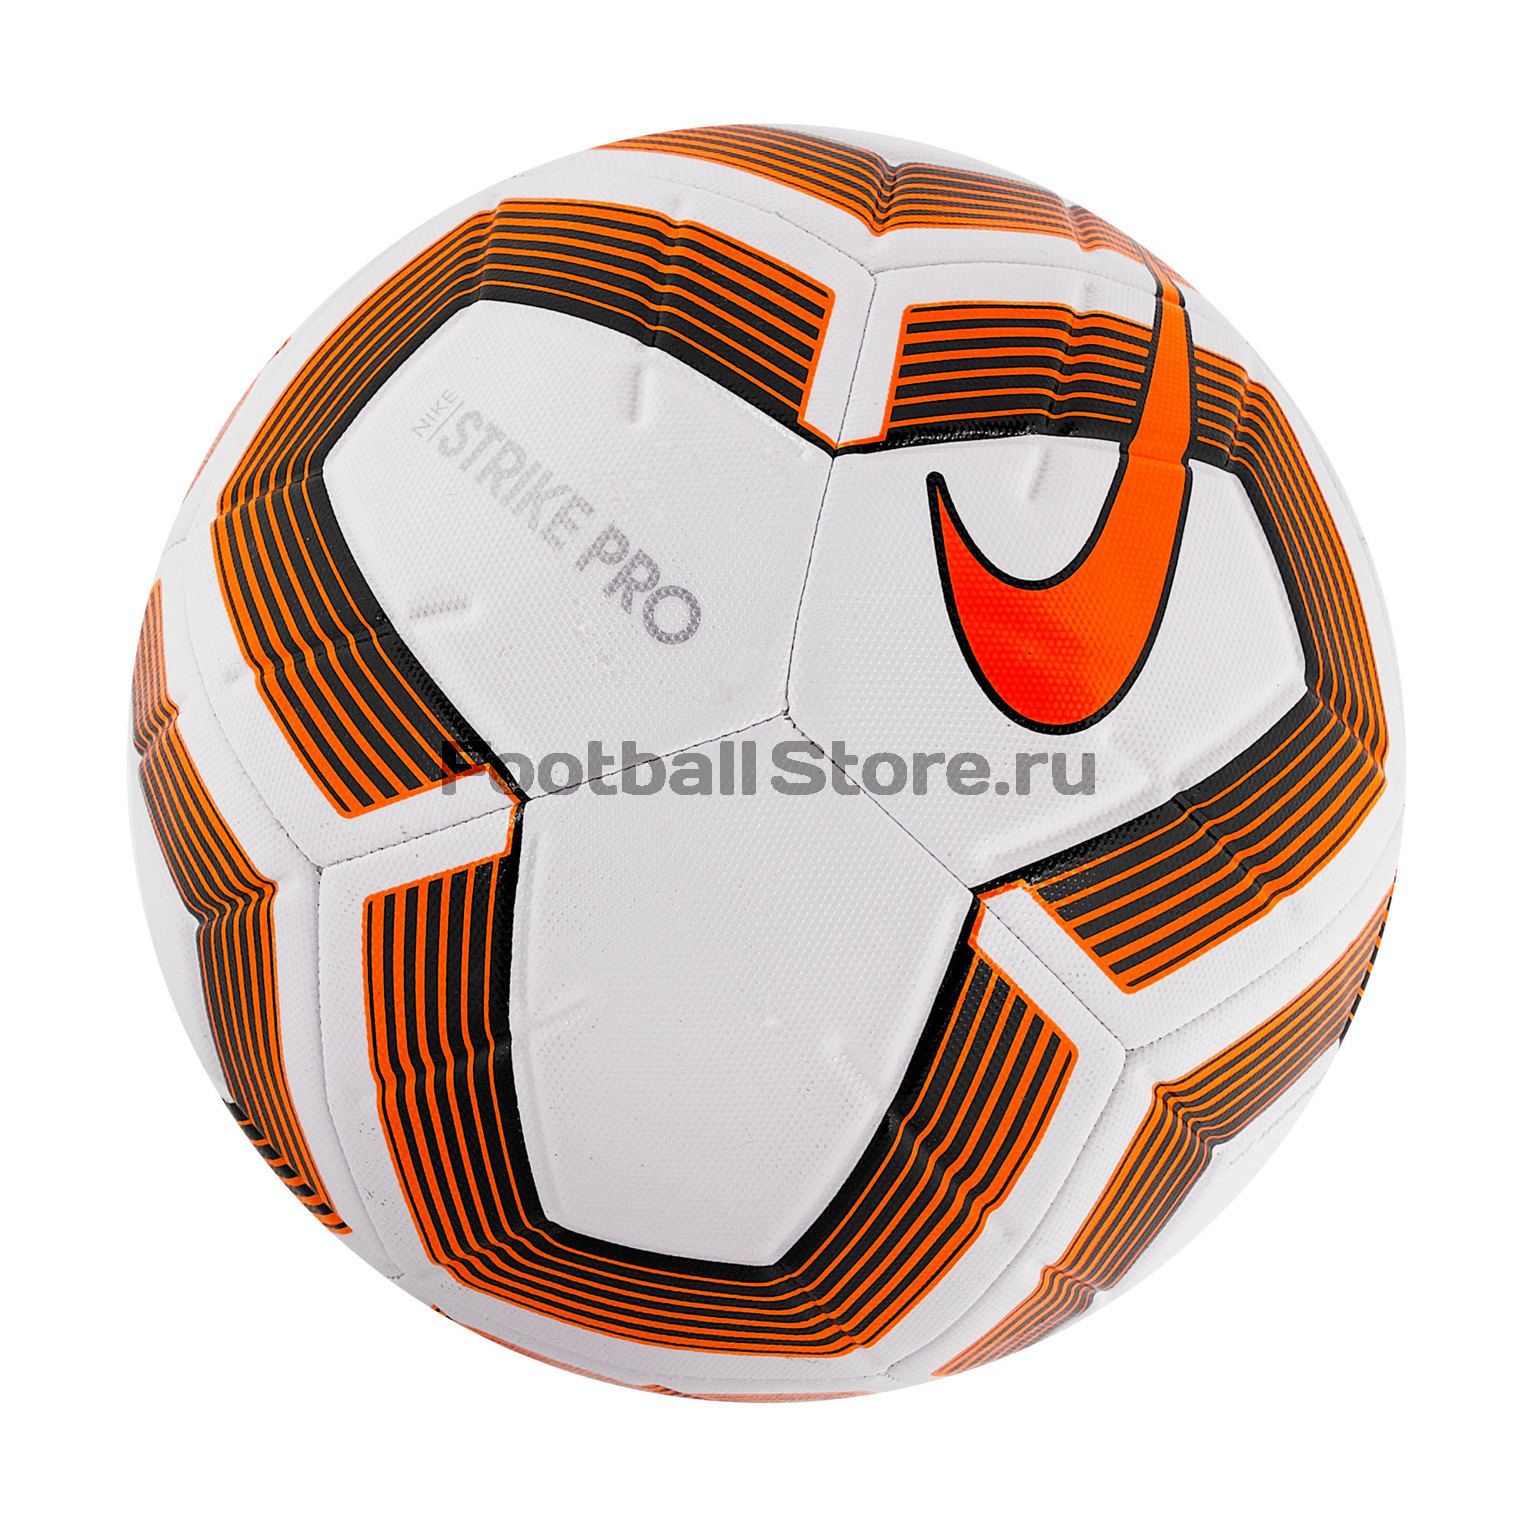 Футбольный мяч Nike Strike Pro Team Fifa SC3539-101